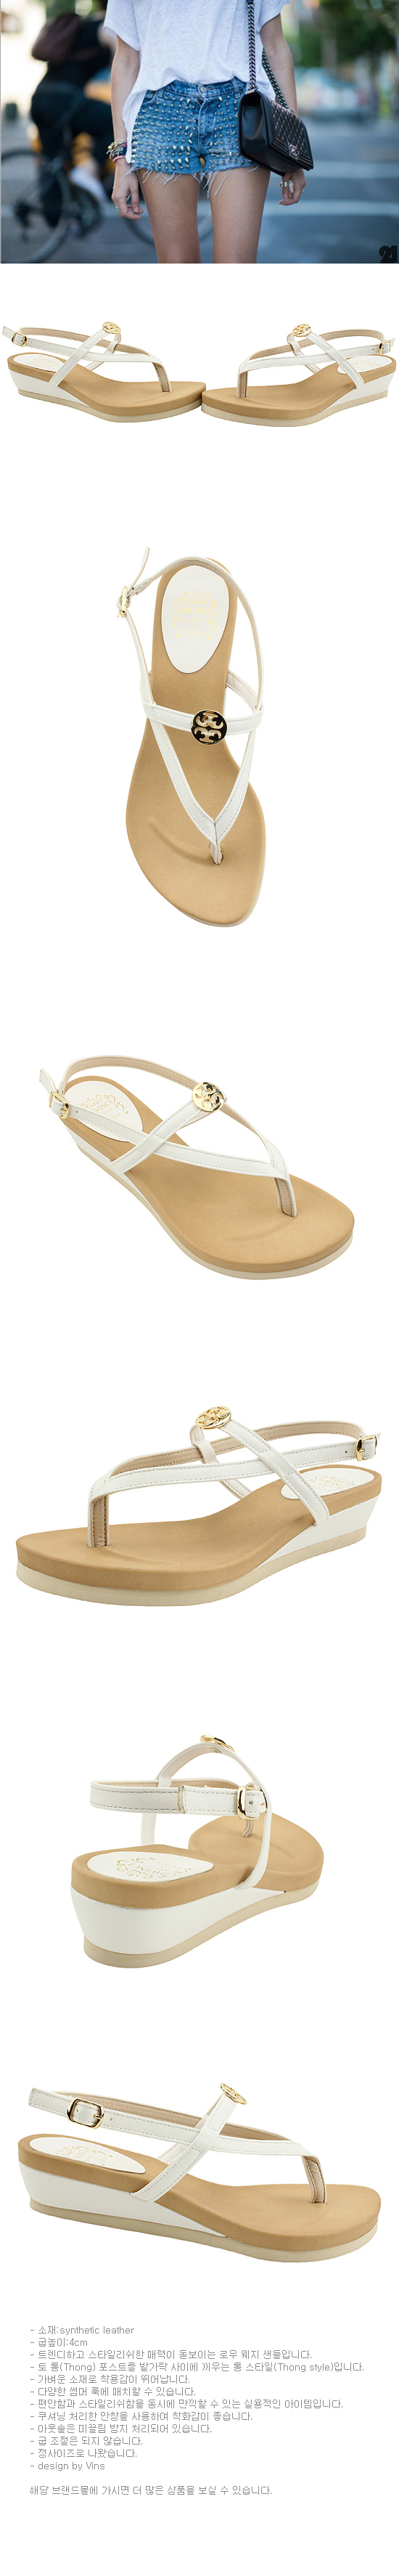 Flip flop strap wedge heel sandals